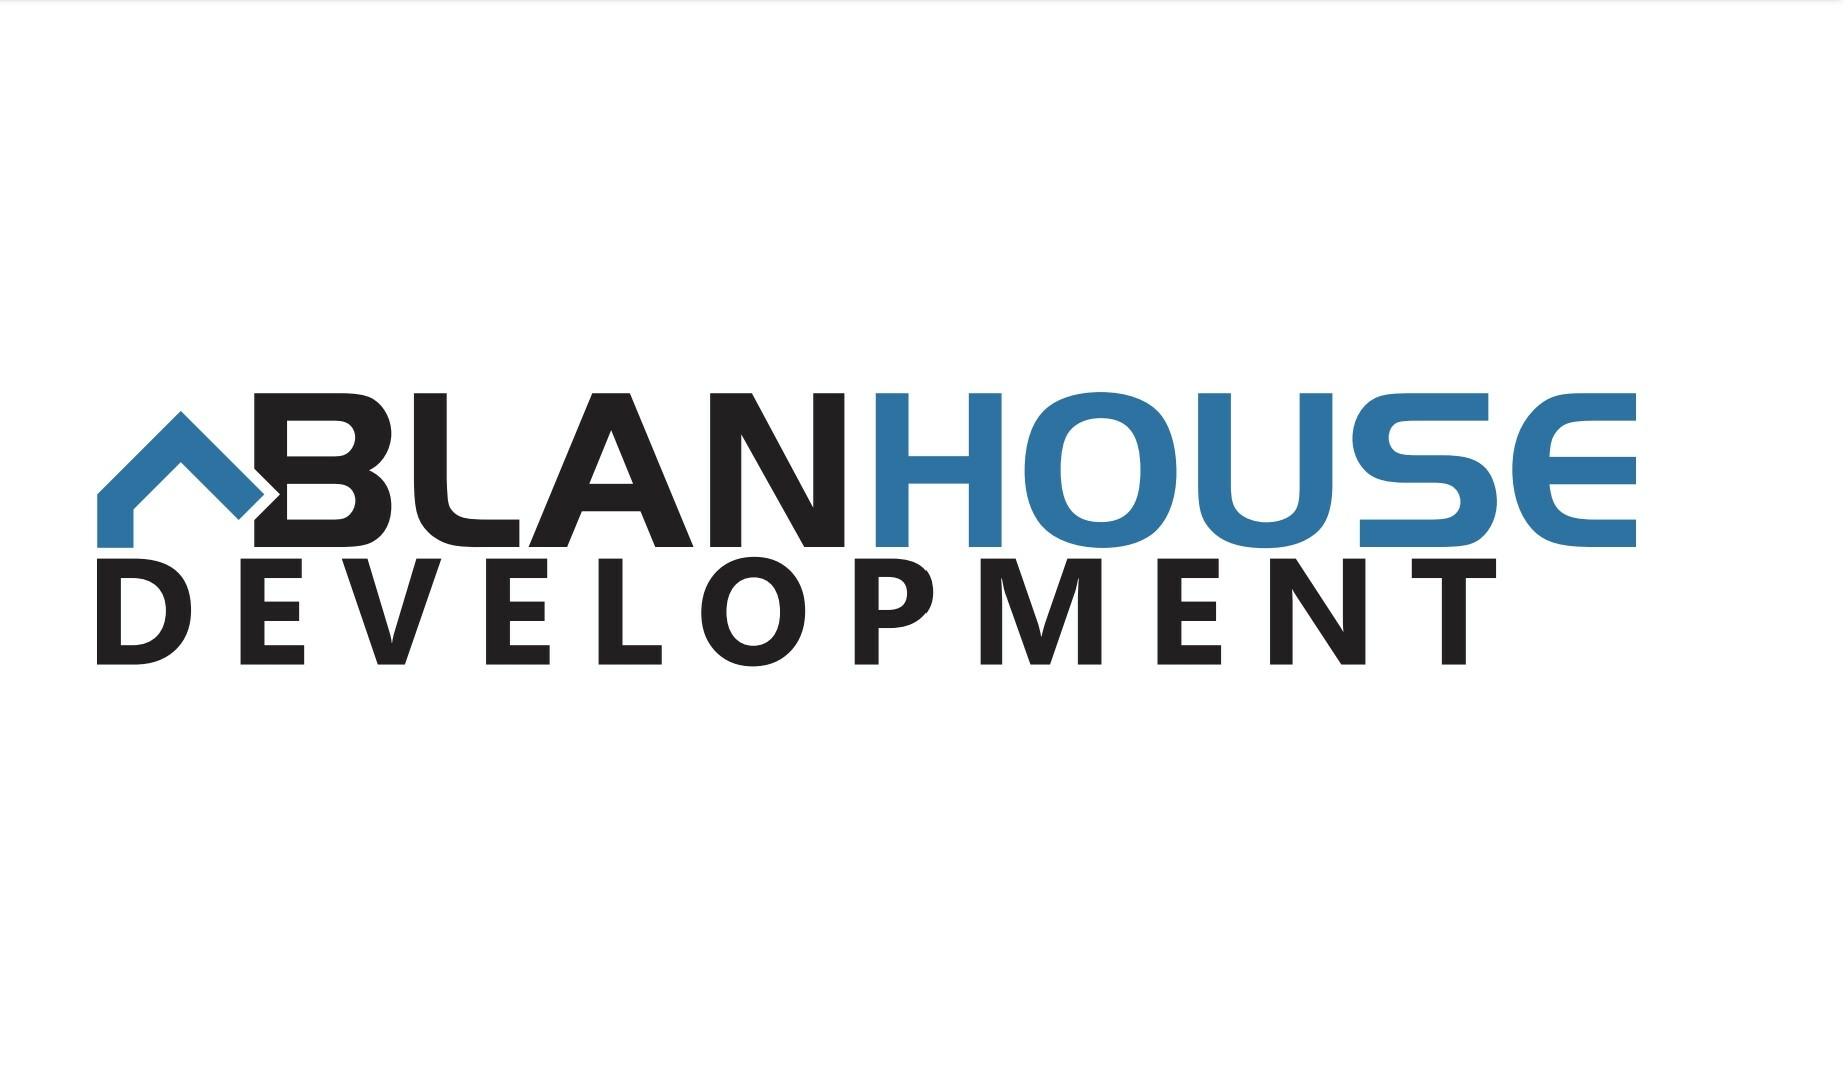 Blanhouse Development